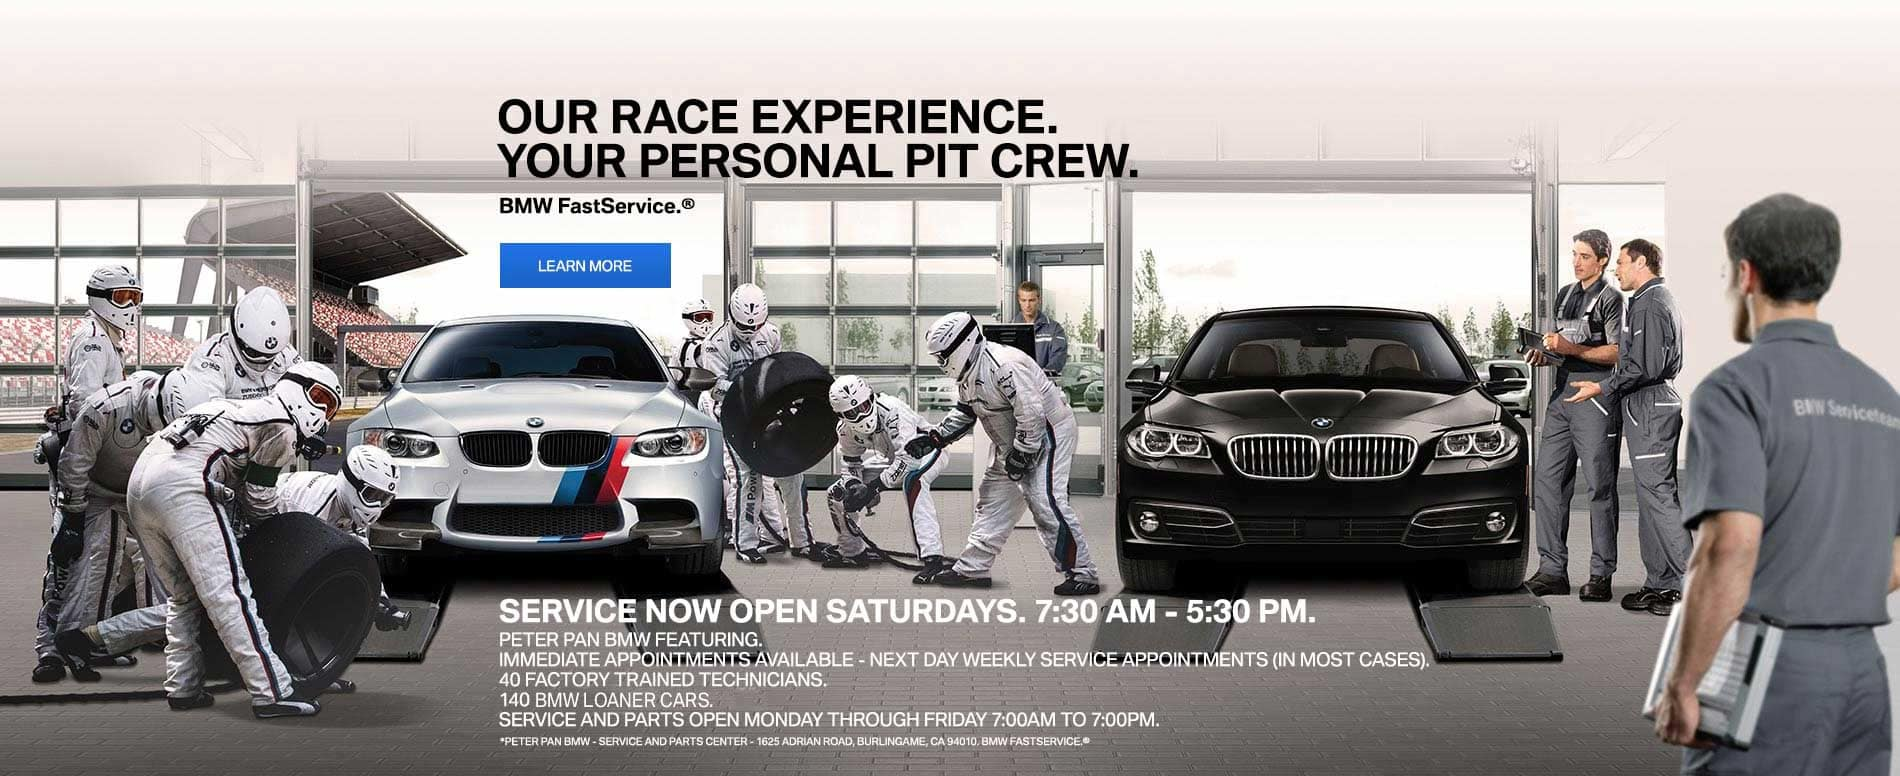 BMW Fast Service